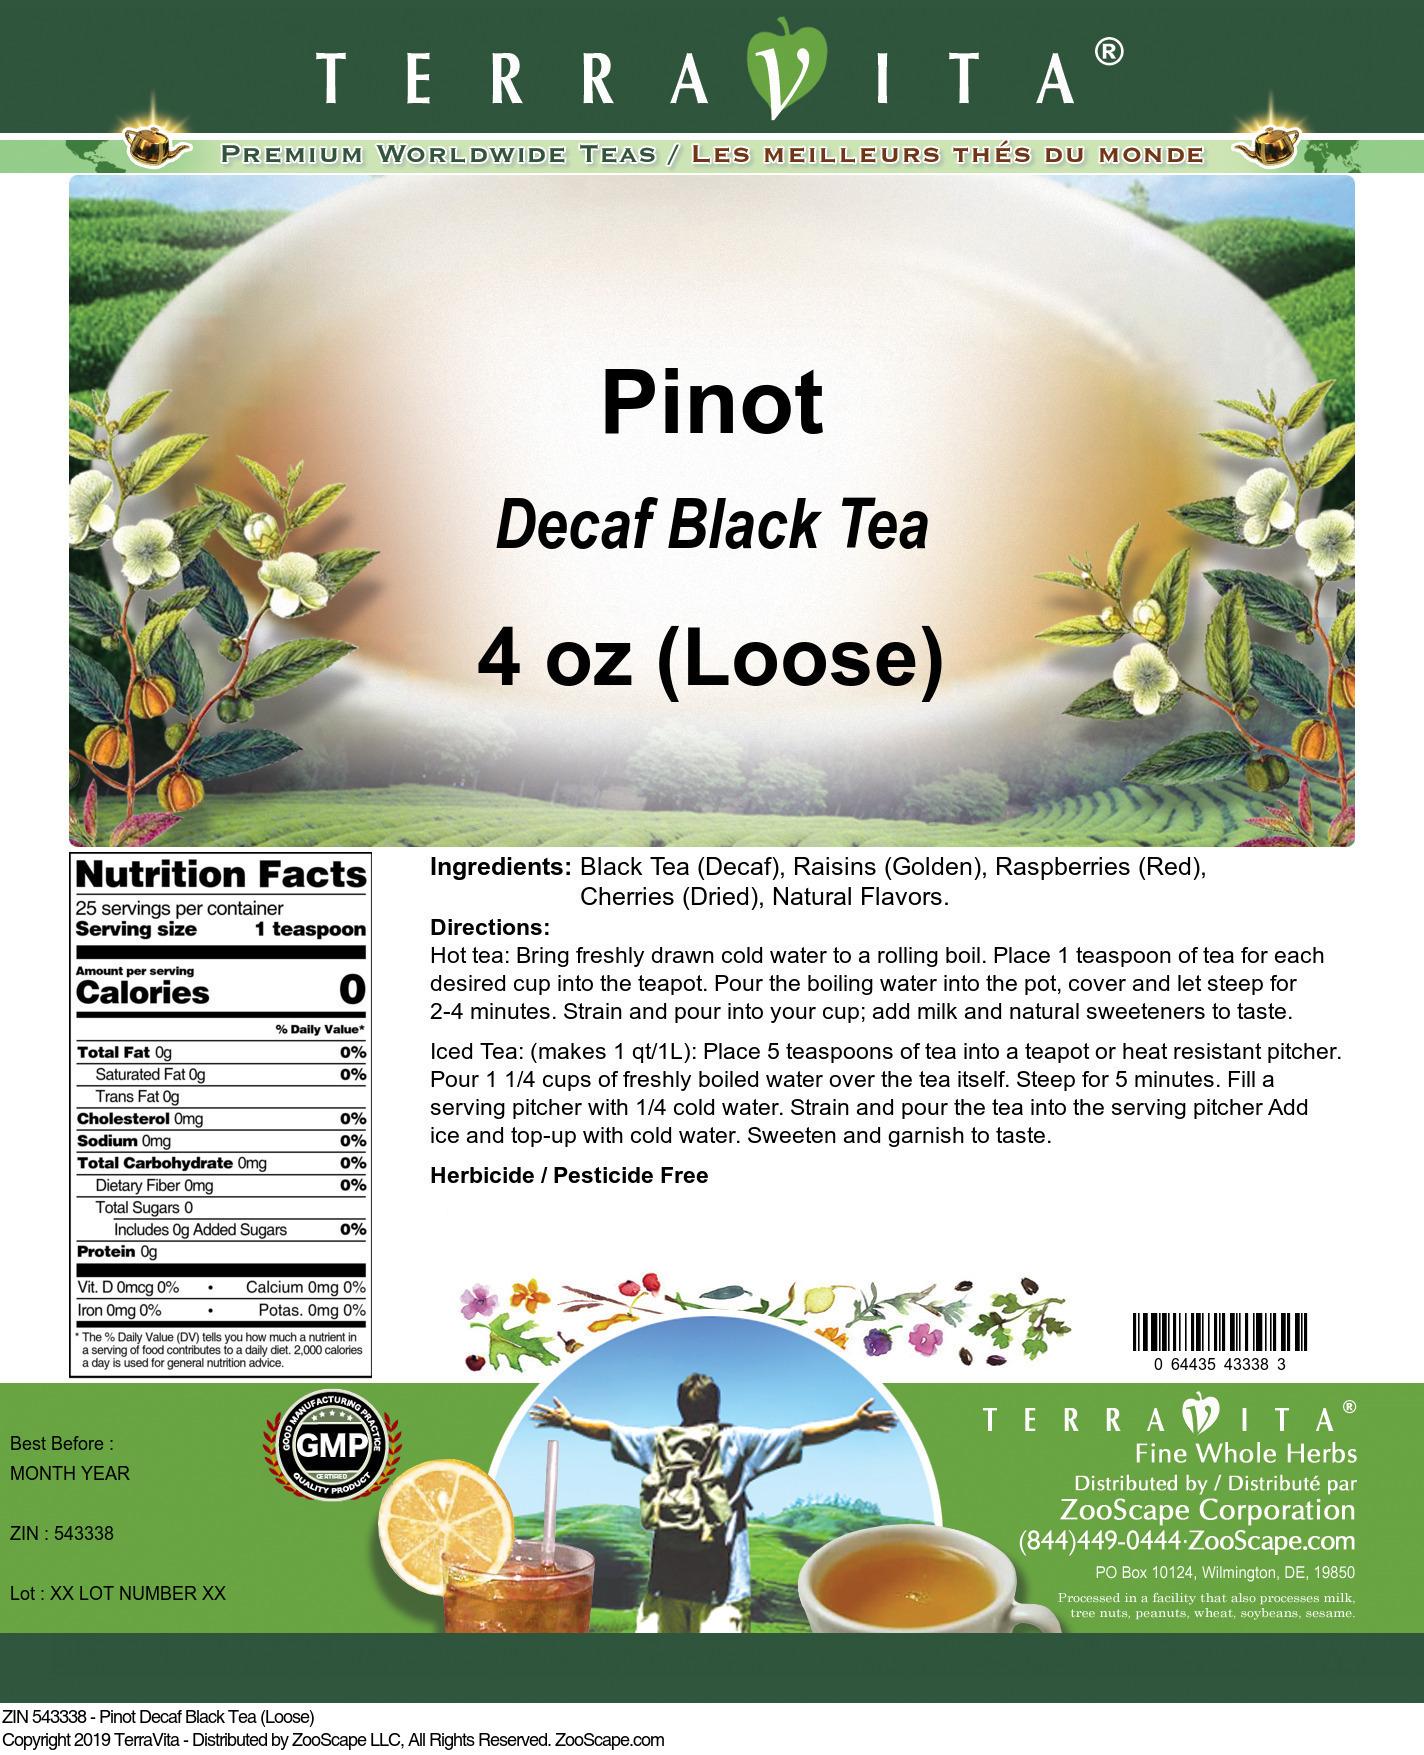 Pinot Decaf Black Tea (Loose)